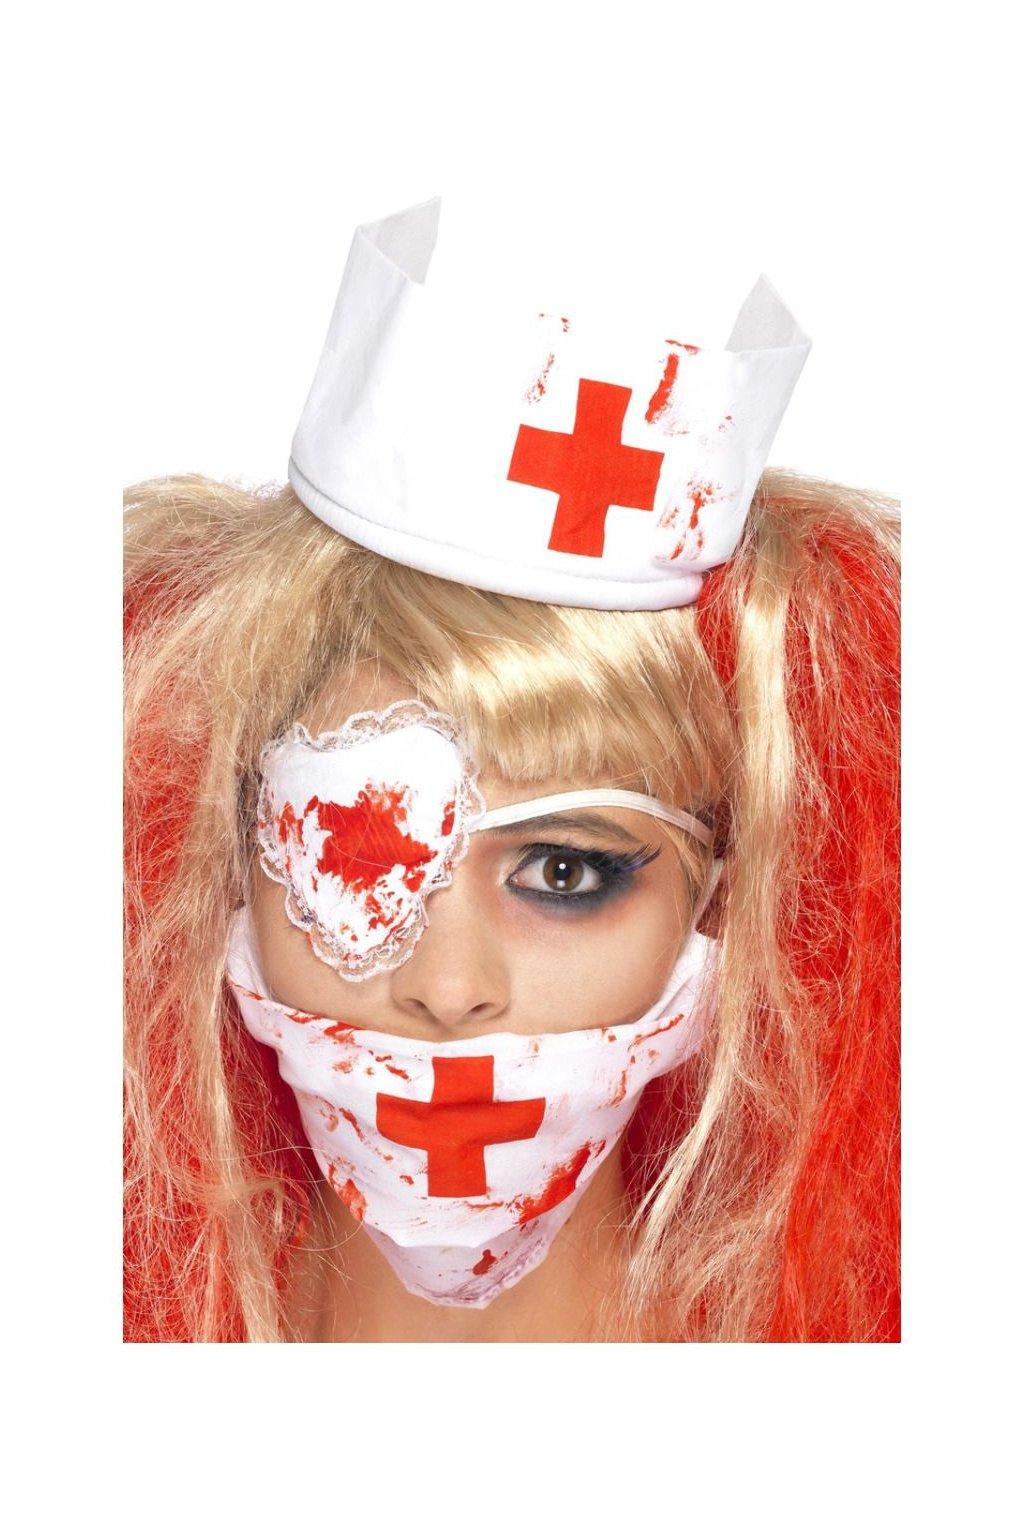 Sada krvavá sestřička - rouška, čepeček, páska přes oko